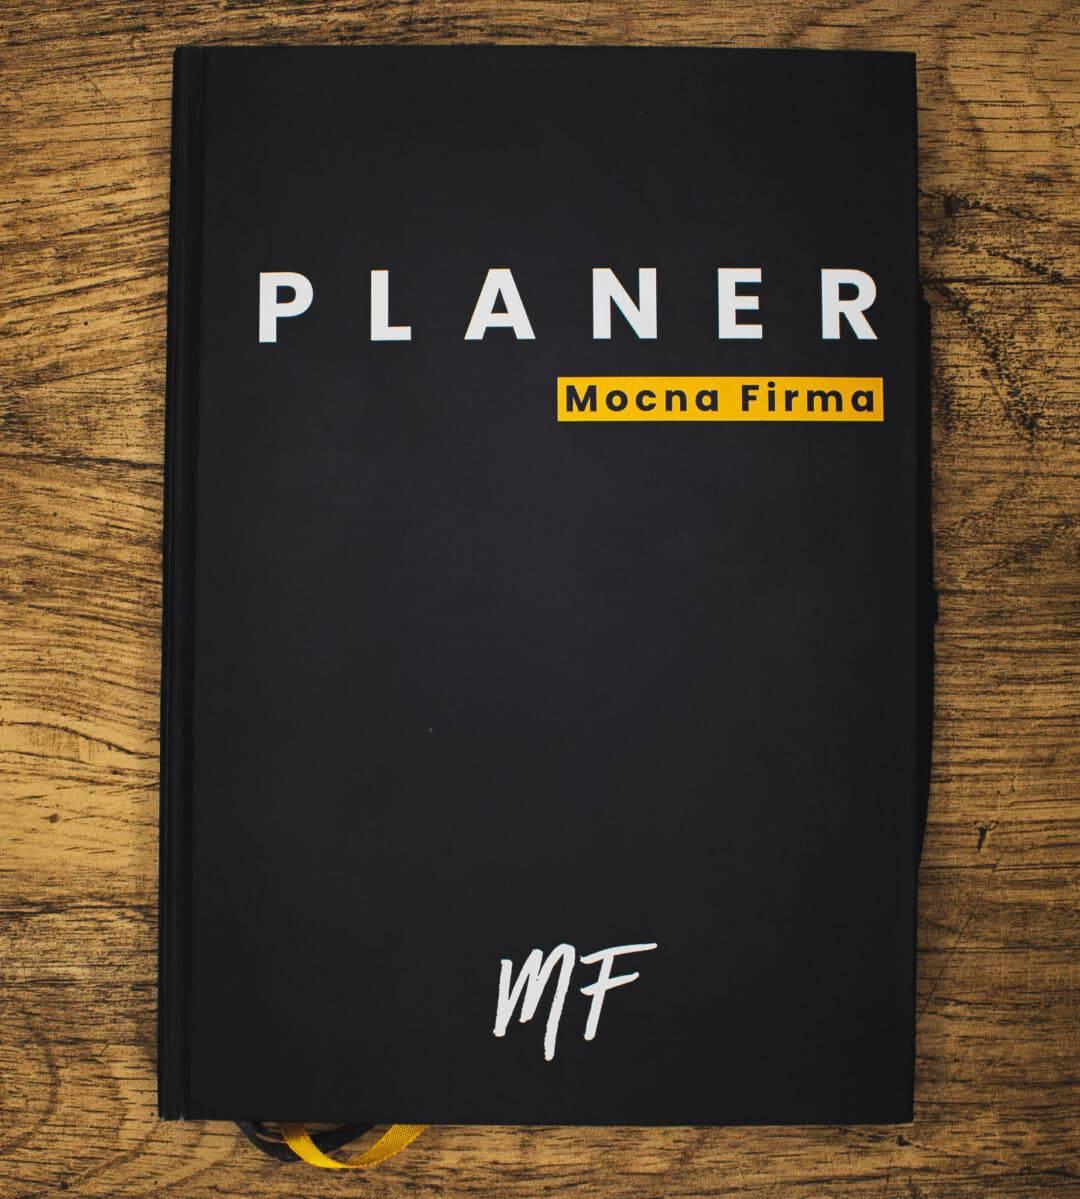 Planer Mocna Firma Okładka przód